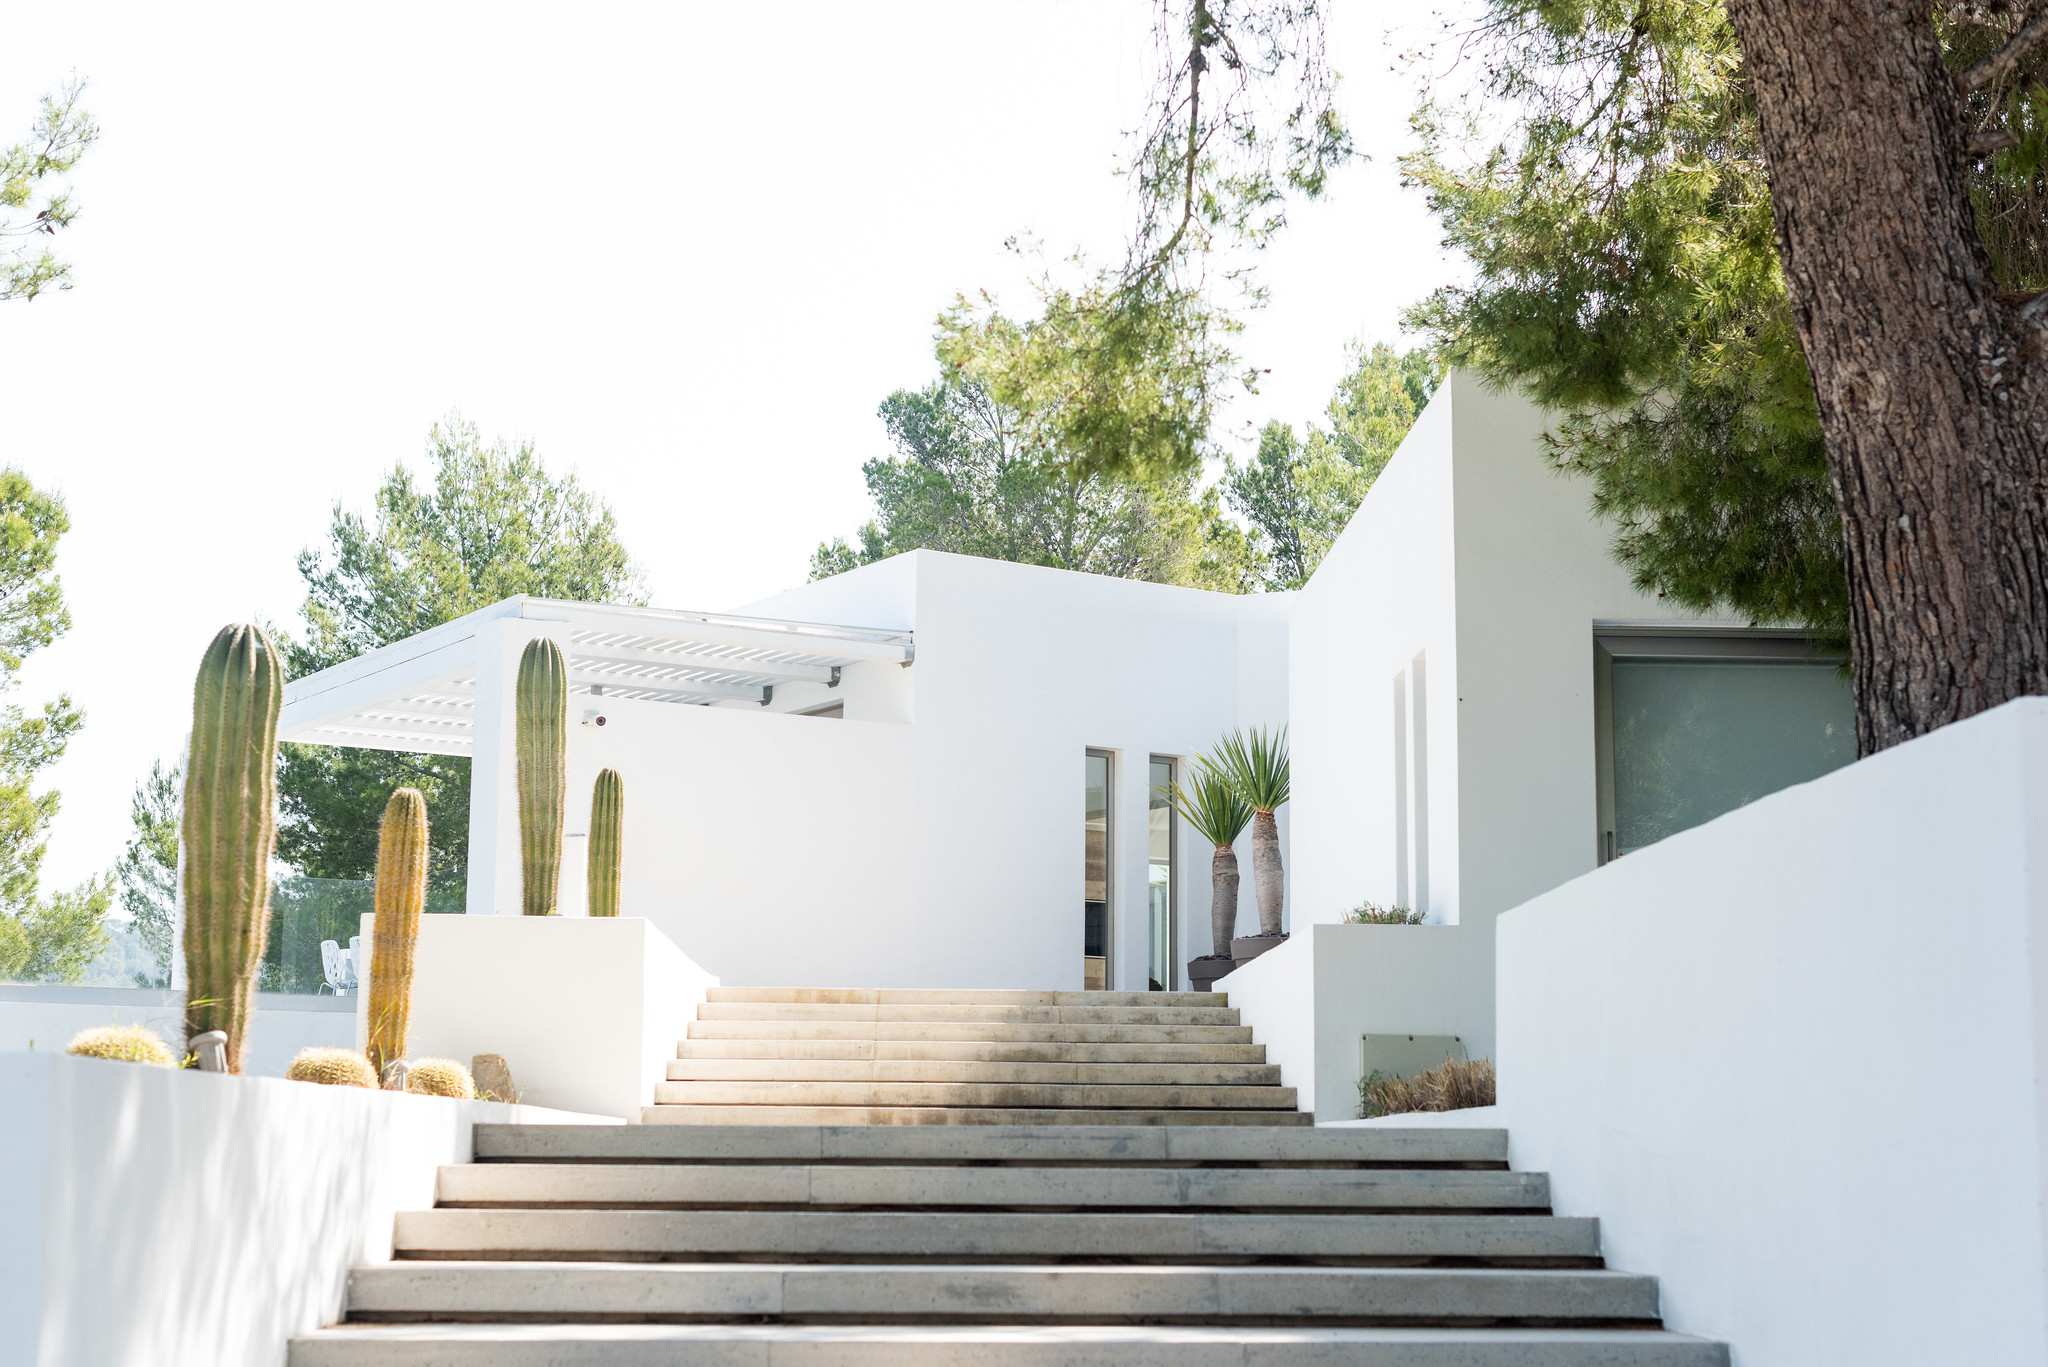 https://www.white-ibiza.com/wp-content/uploads/2020/05/white-ibiza-villas-can-dela-entrance.jpg